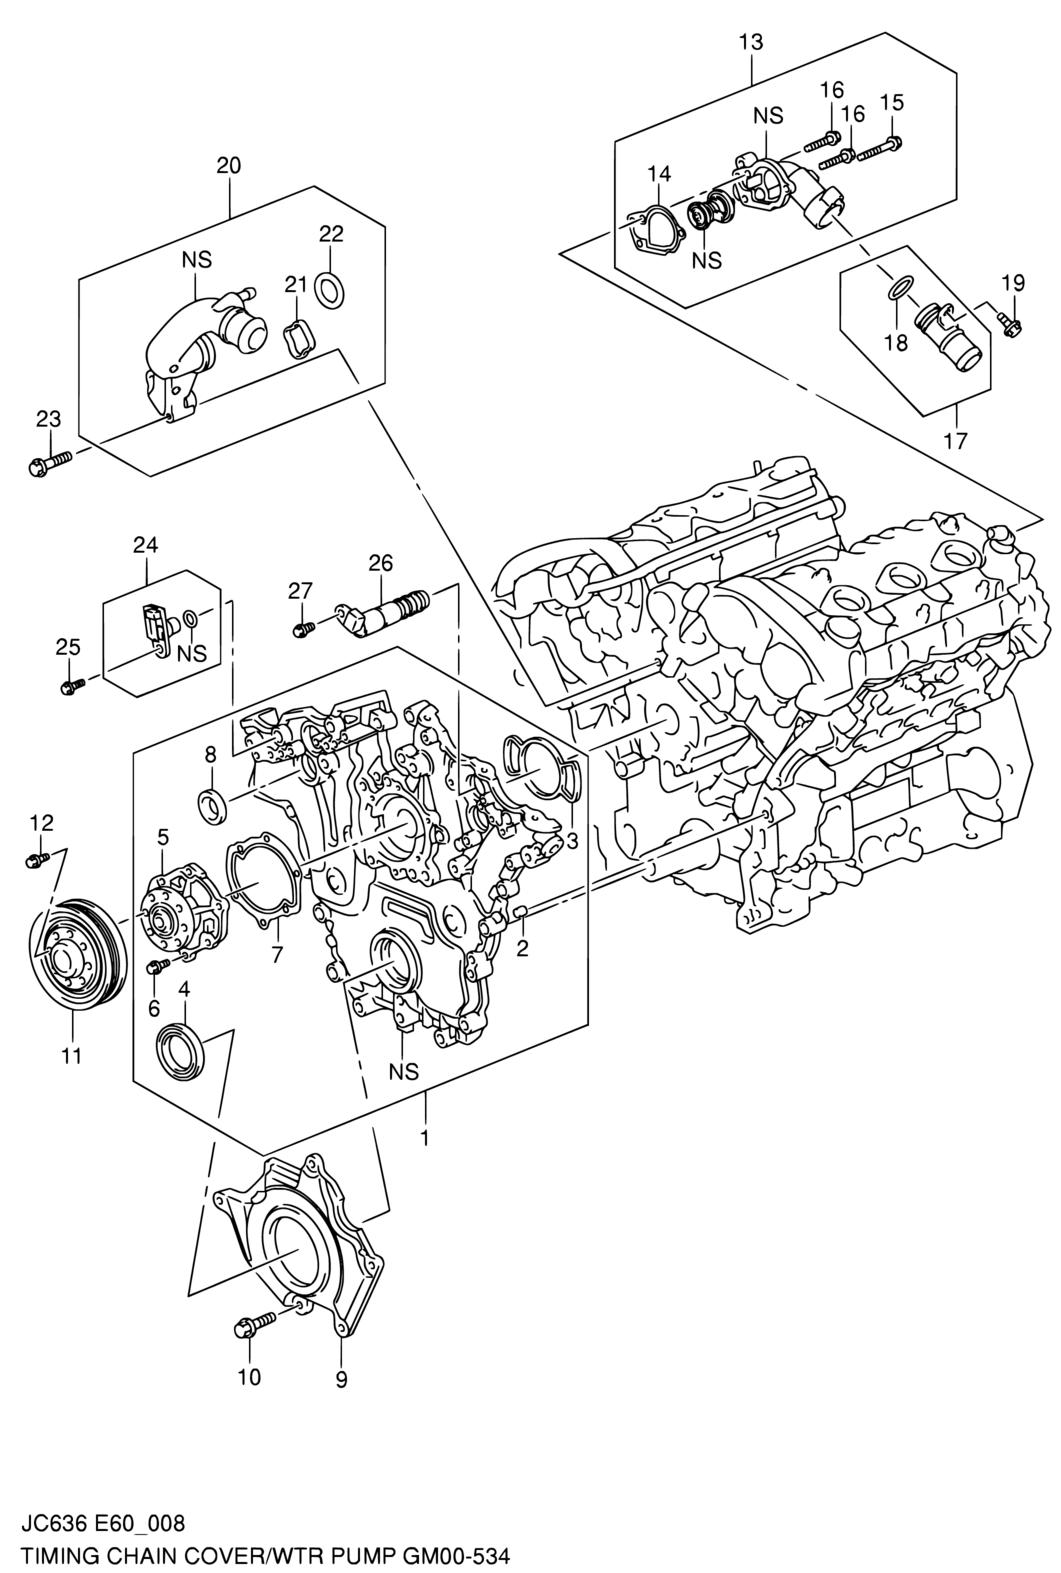 Latin America Grand Vitara Xl7 Jc636 E10e49e60e62e63e71my. Suzuki. 2008 Suzuki Grand Vitara Water Pump Diagram At Scoala.co